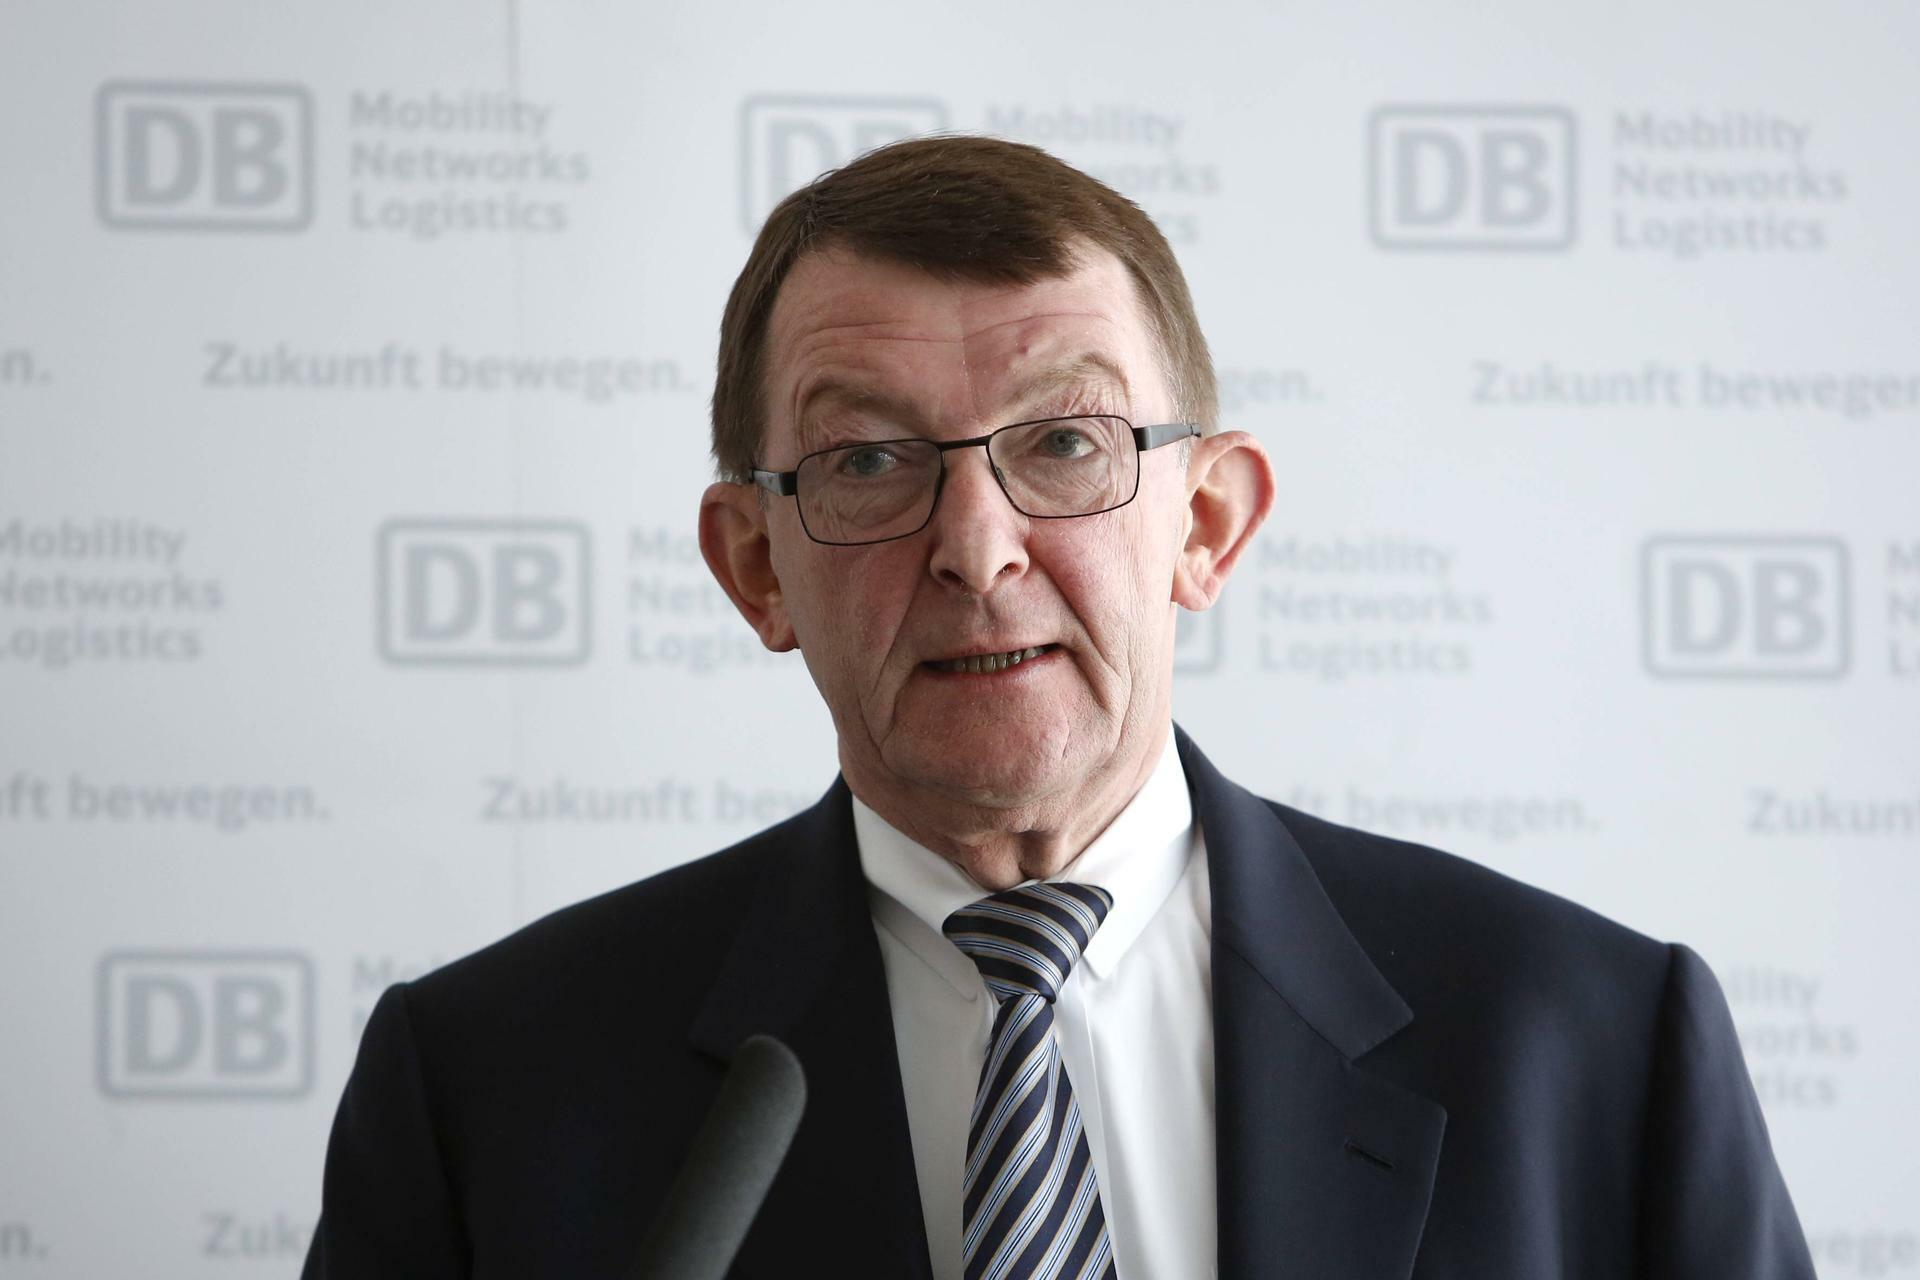 Deutsche Bahn Aufsichtsratschef Felcht Vor Dem Rücktritt